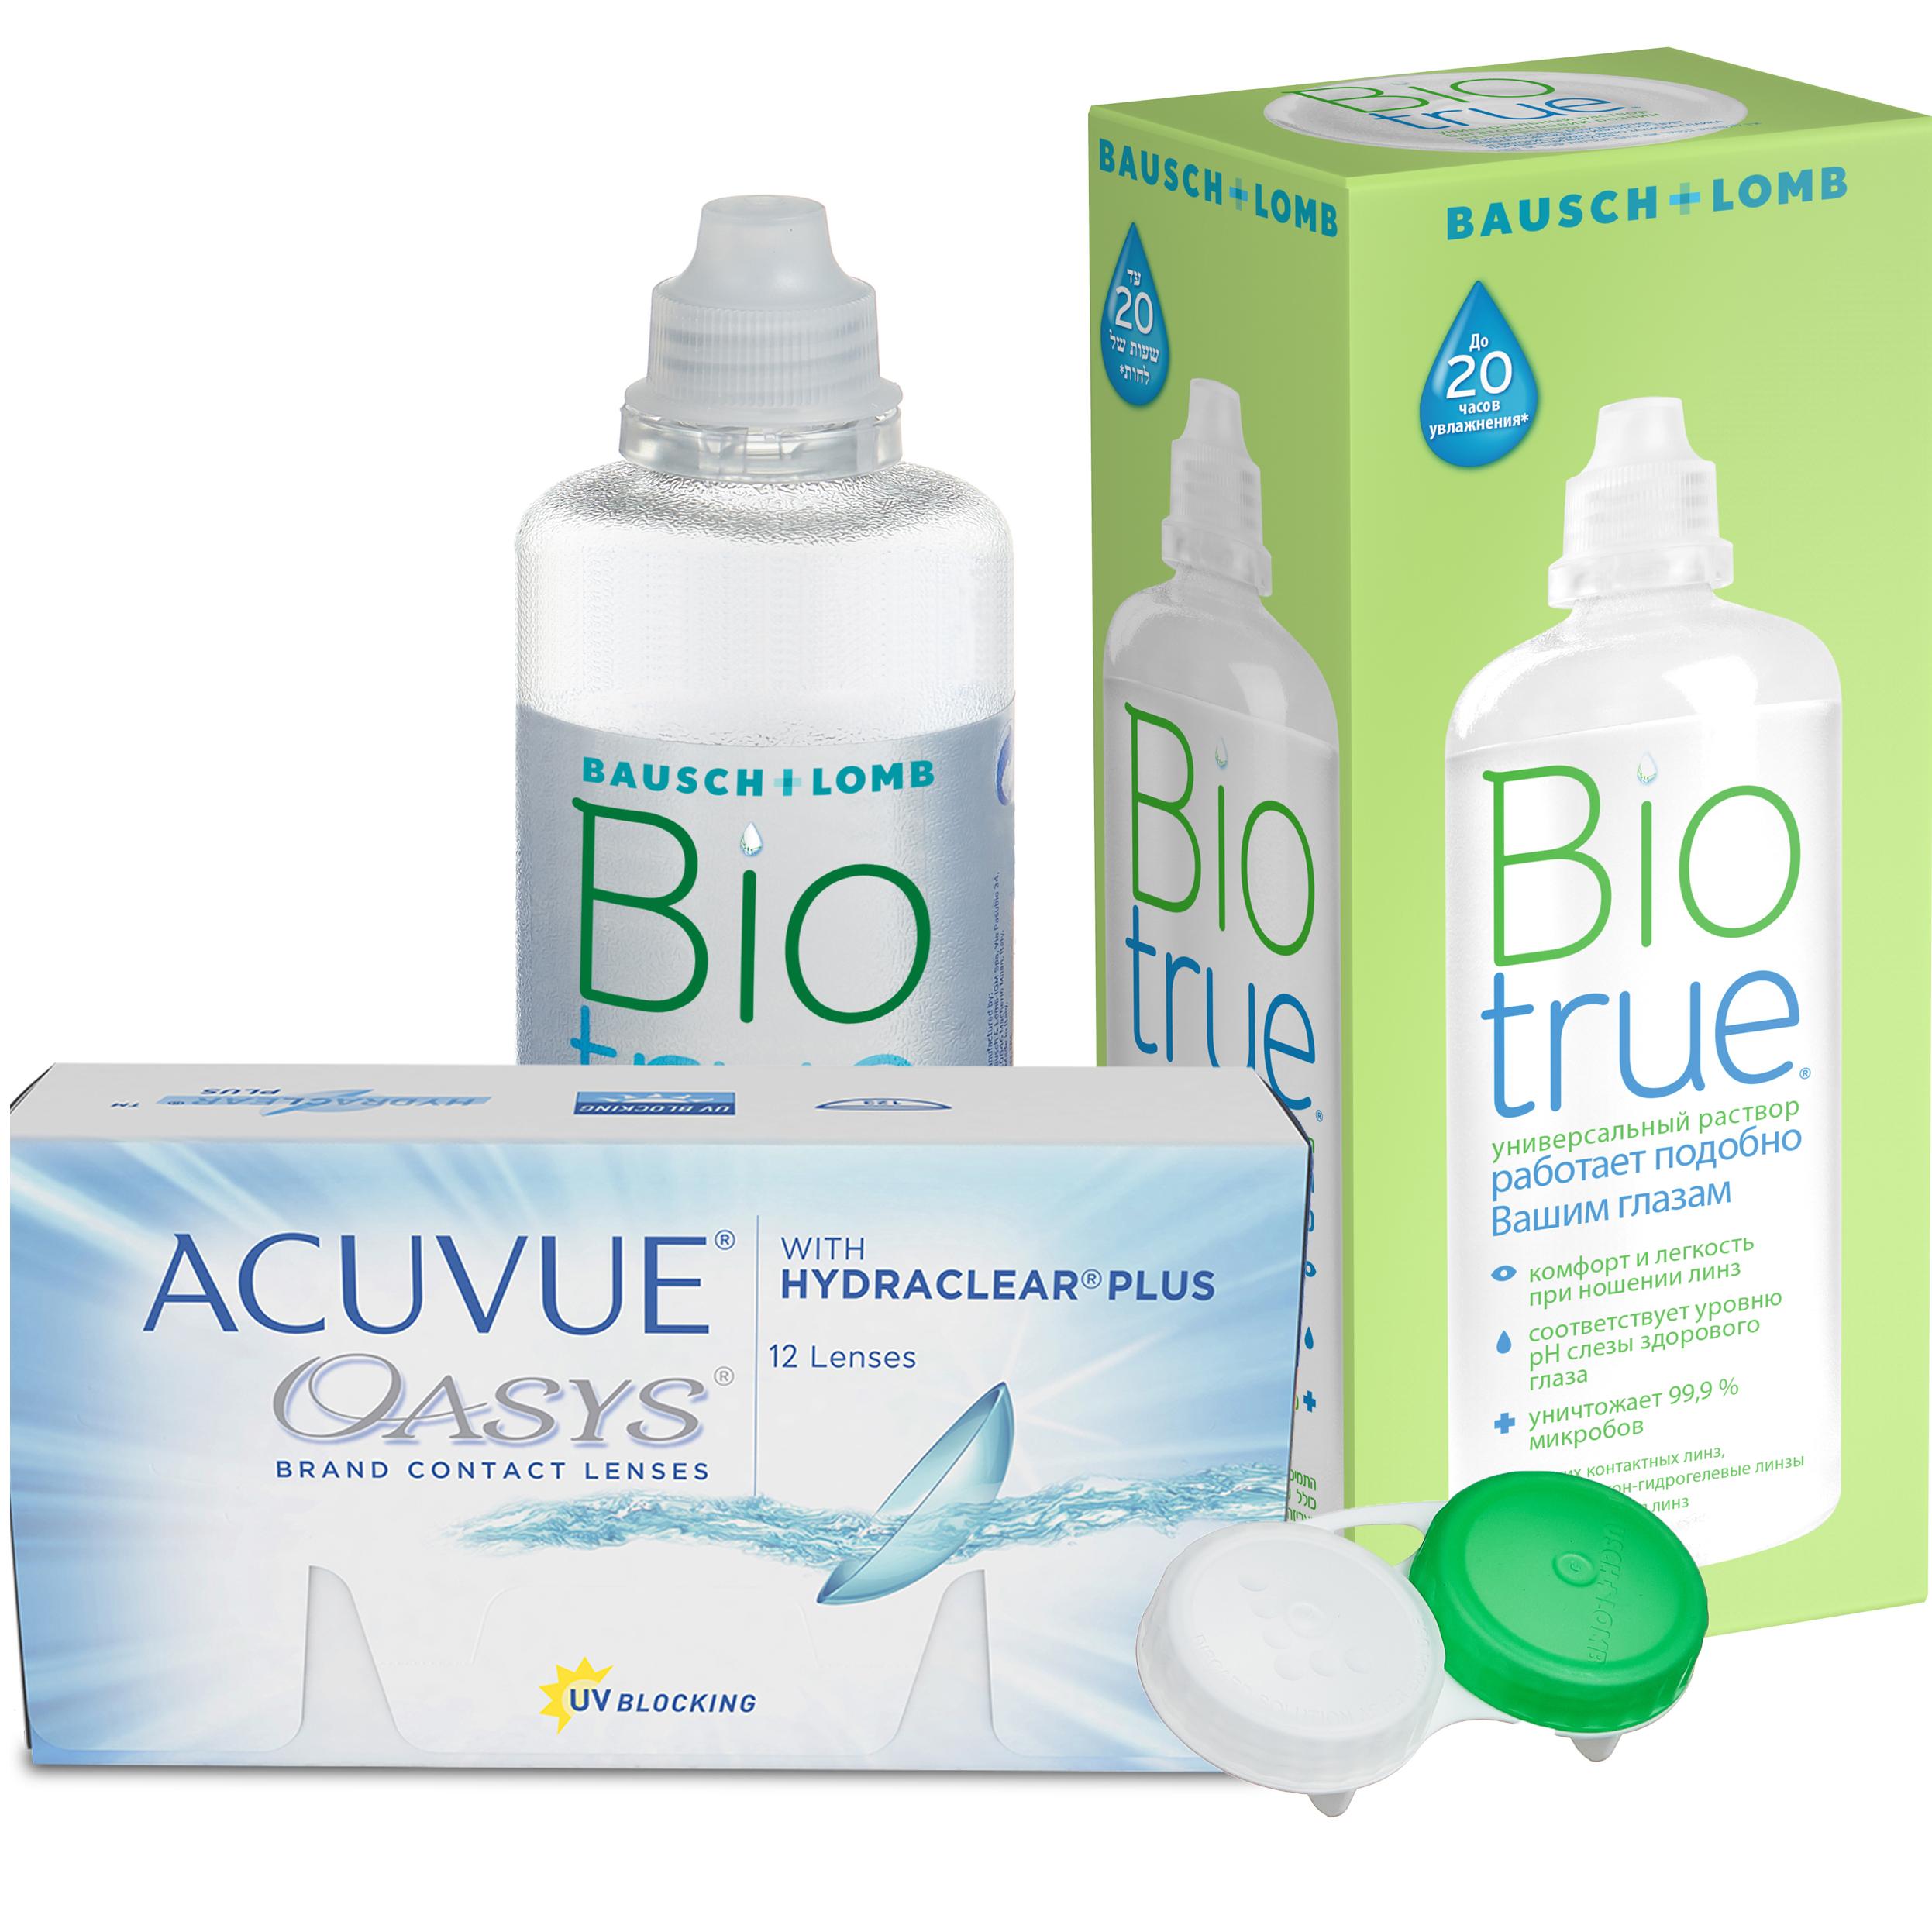 Купить Oasys with Hydraclear Plus 12 линз + Biotrue, Контактные линзы Acuvue Oasys with Hydraclear Plus 12 линз R 8.4 -7, 50 + Biotrue 300 мл